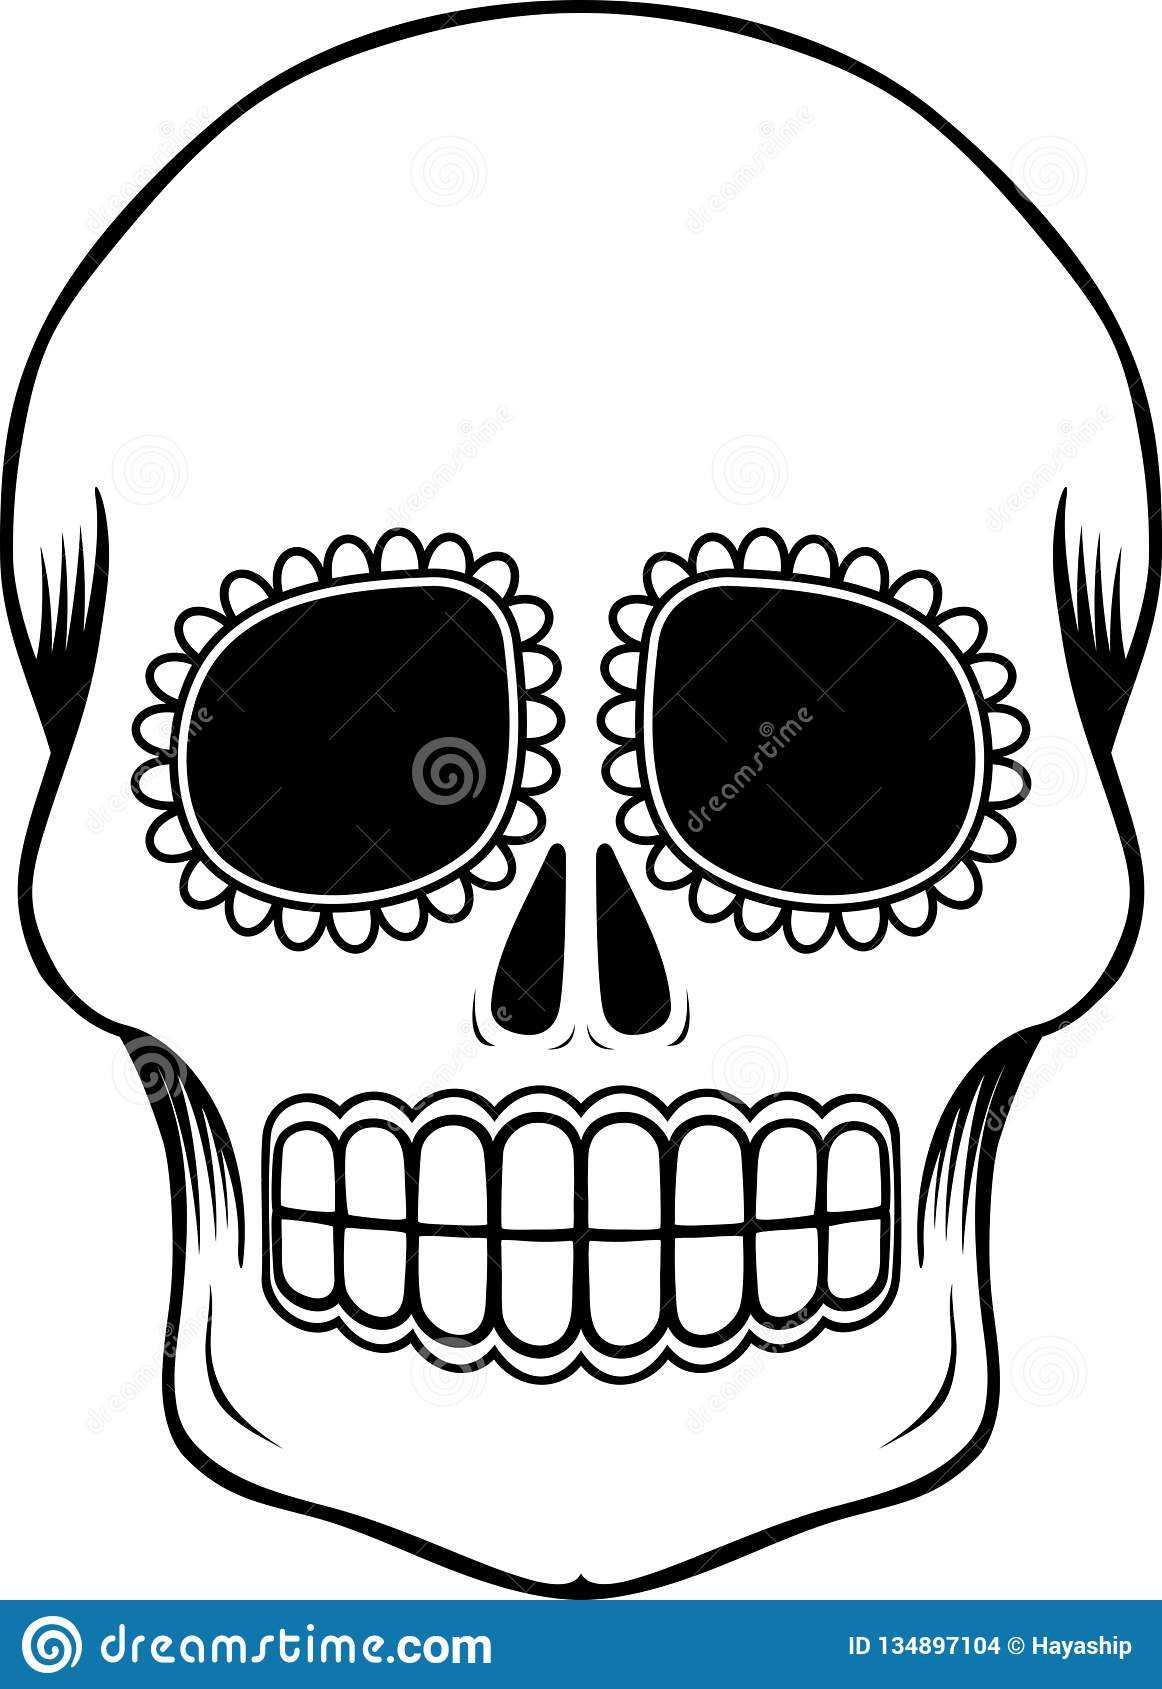 Mexican Sugar Skull Template Stock Vector - Illustration Of With Regard To Blank Sugar Skull Template